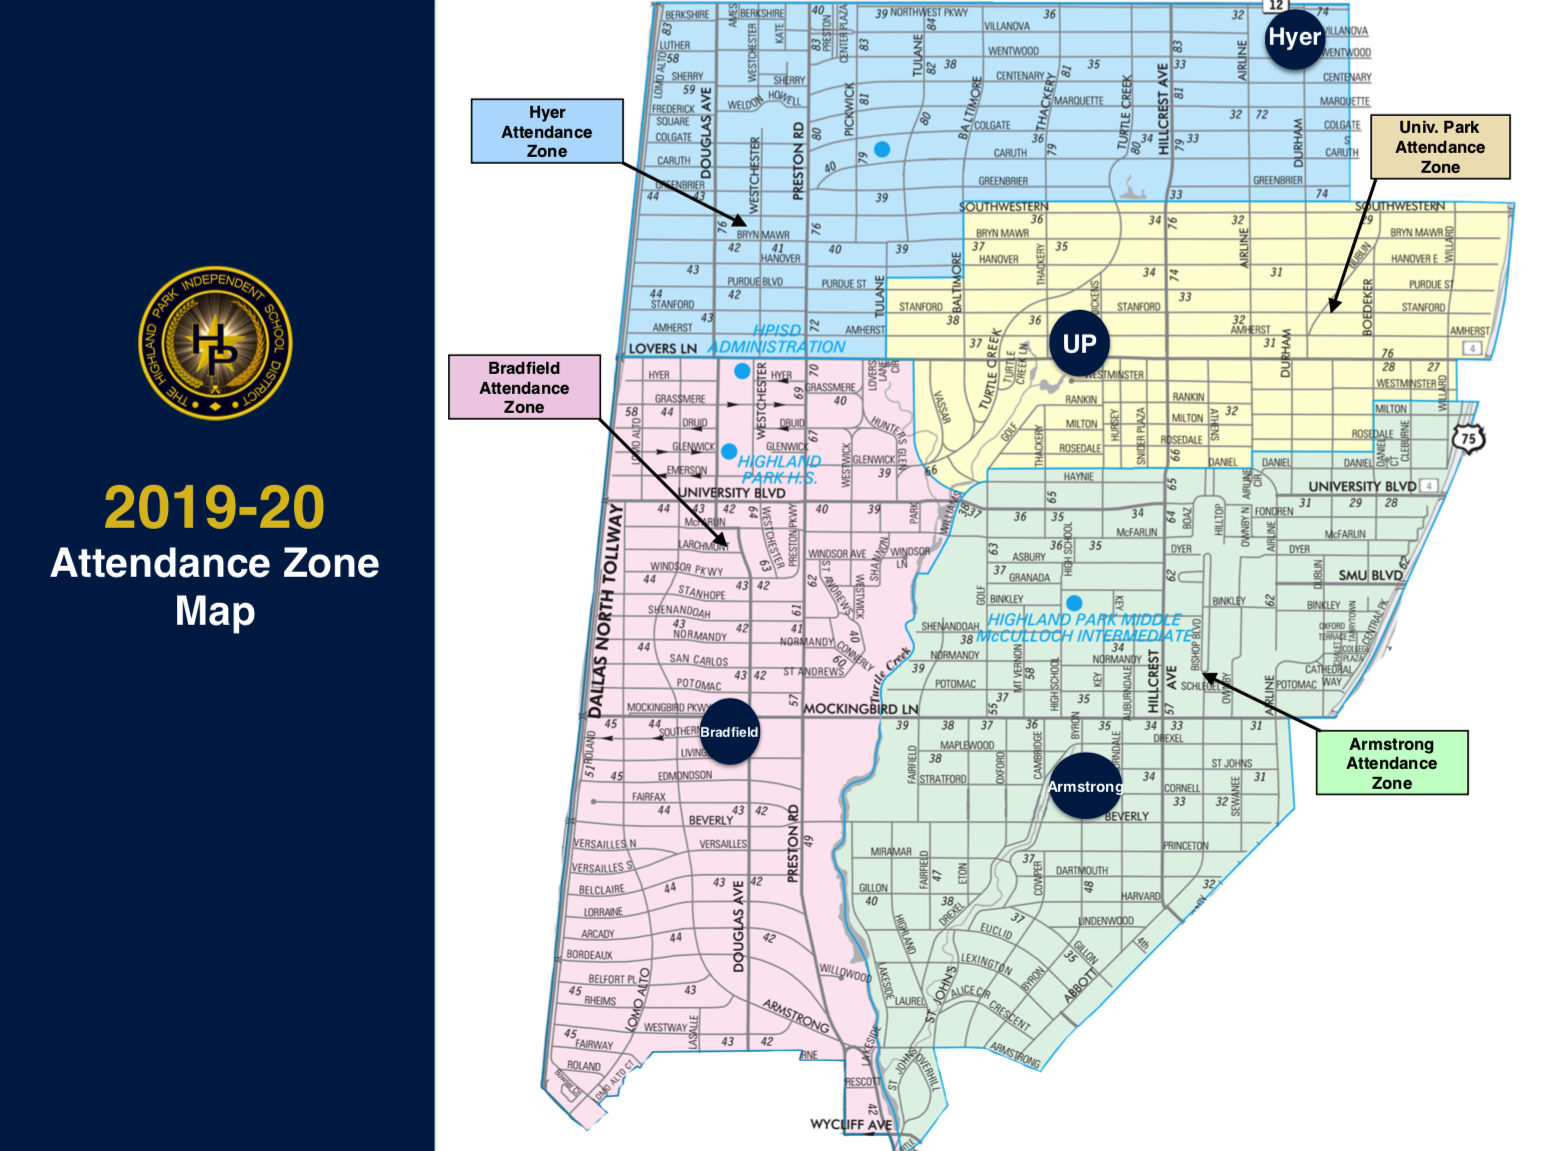 2019-20 boundary zone map